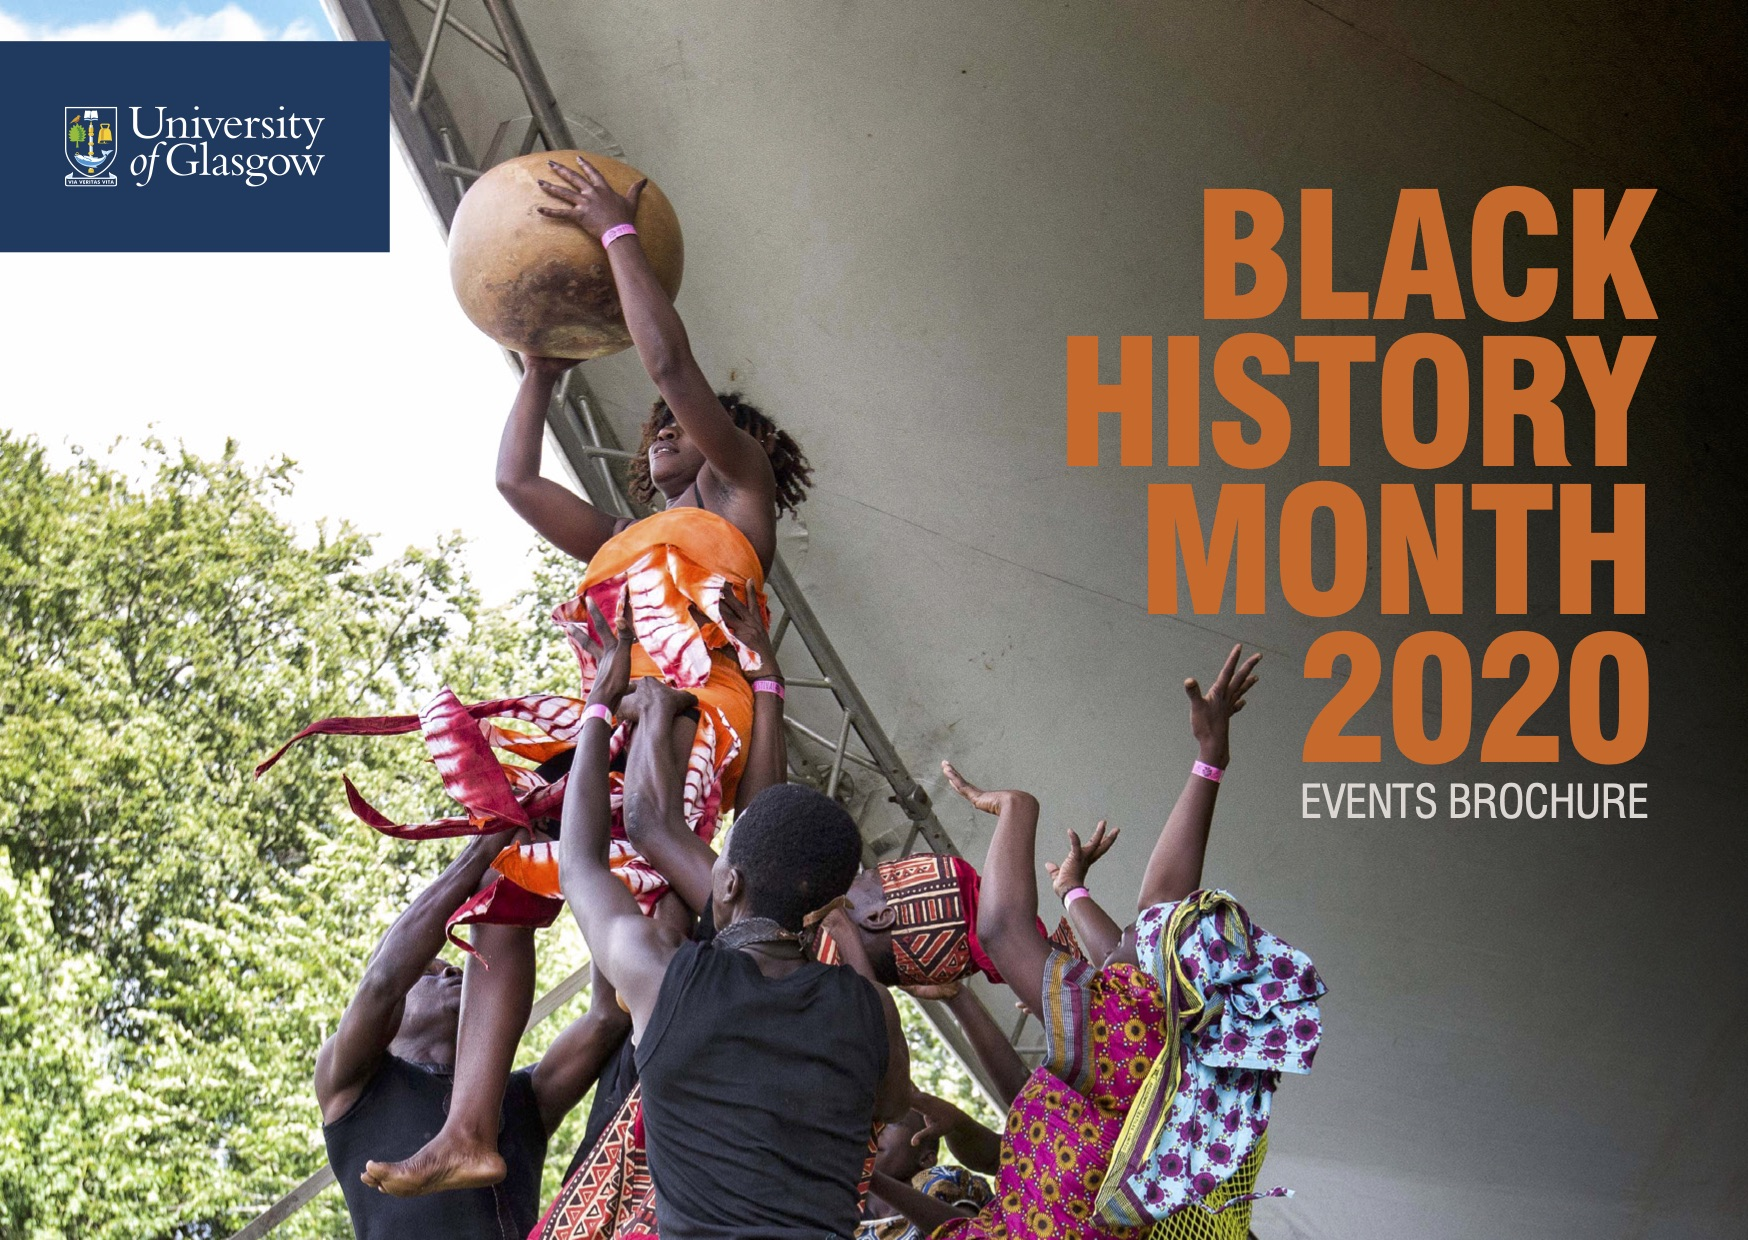 UofG Black History Month